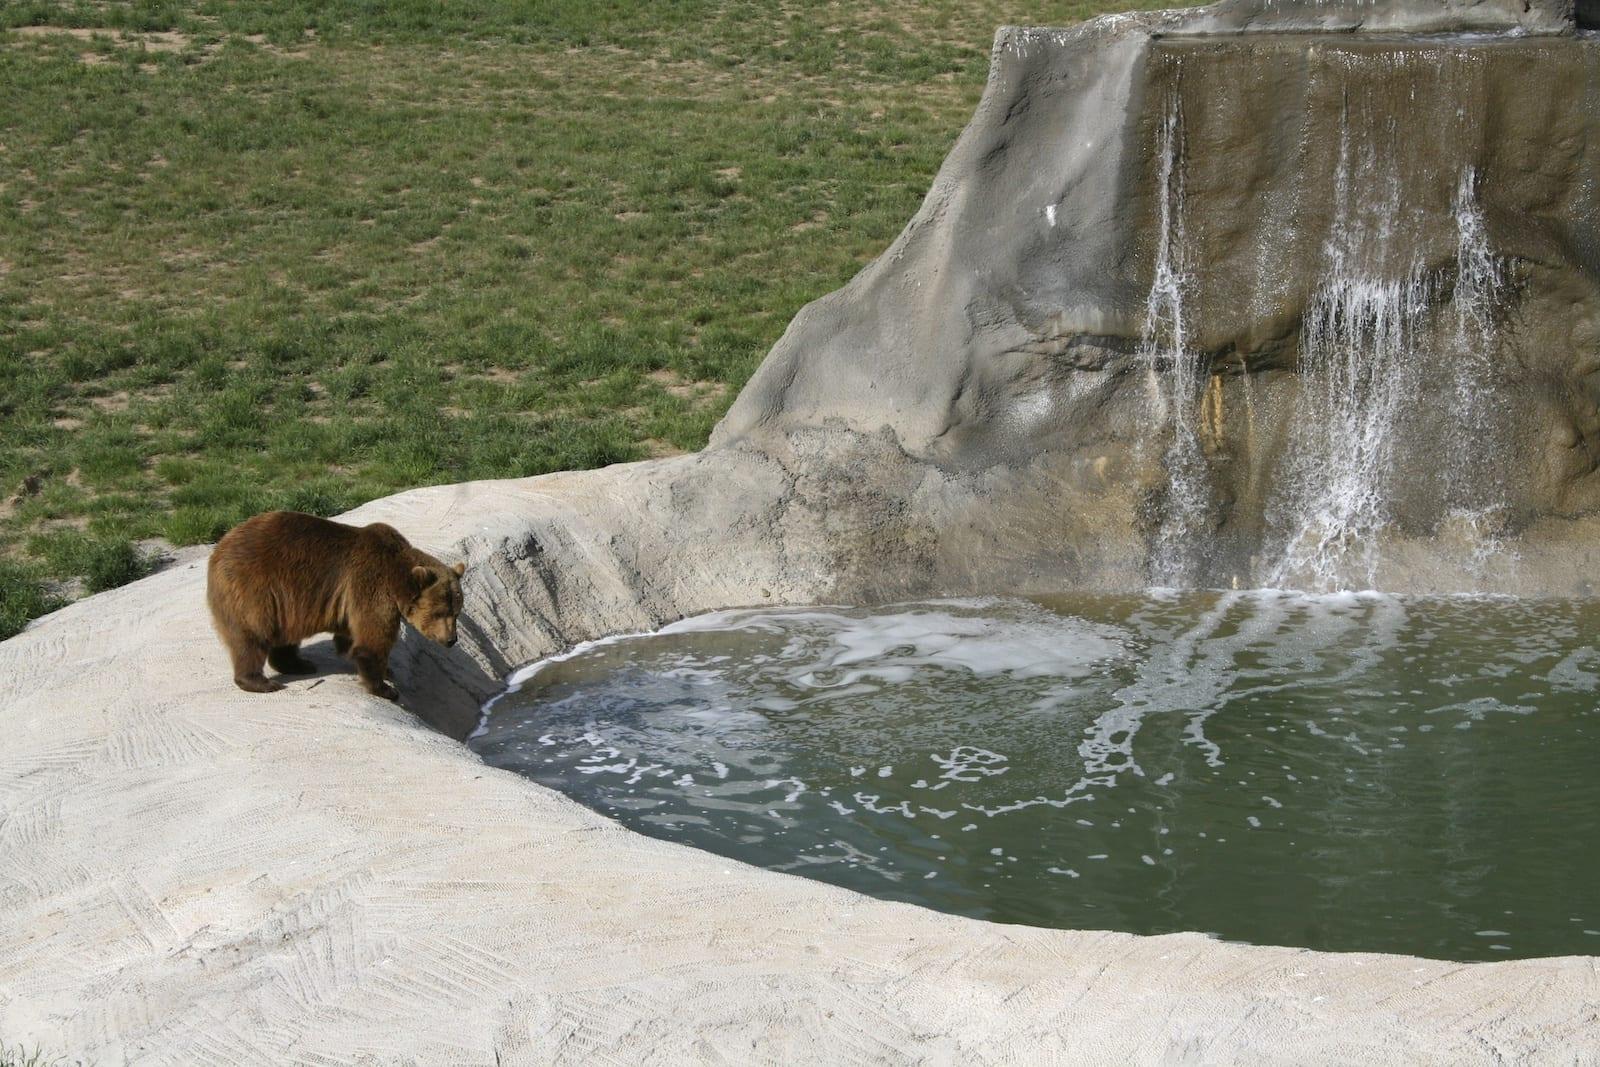 Grizzly Bear Wild Animal Sanctuary Keenesburg CO